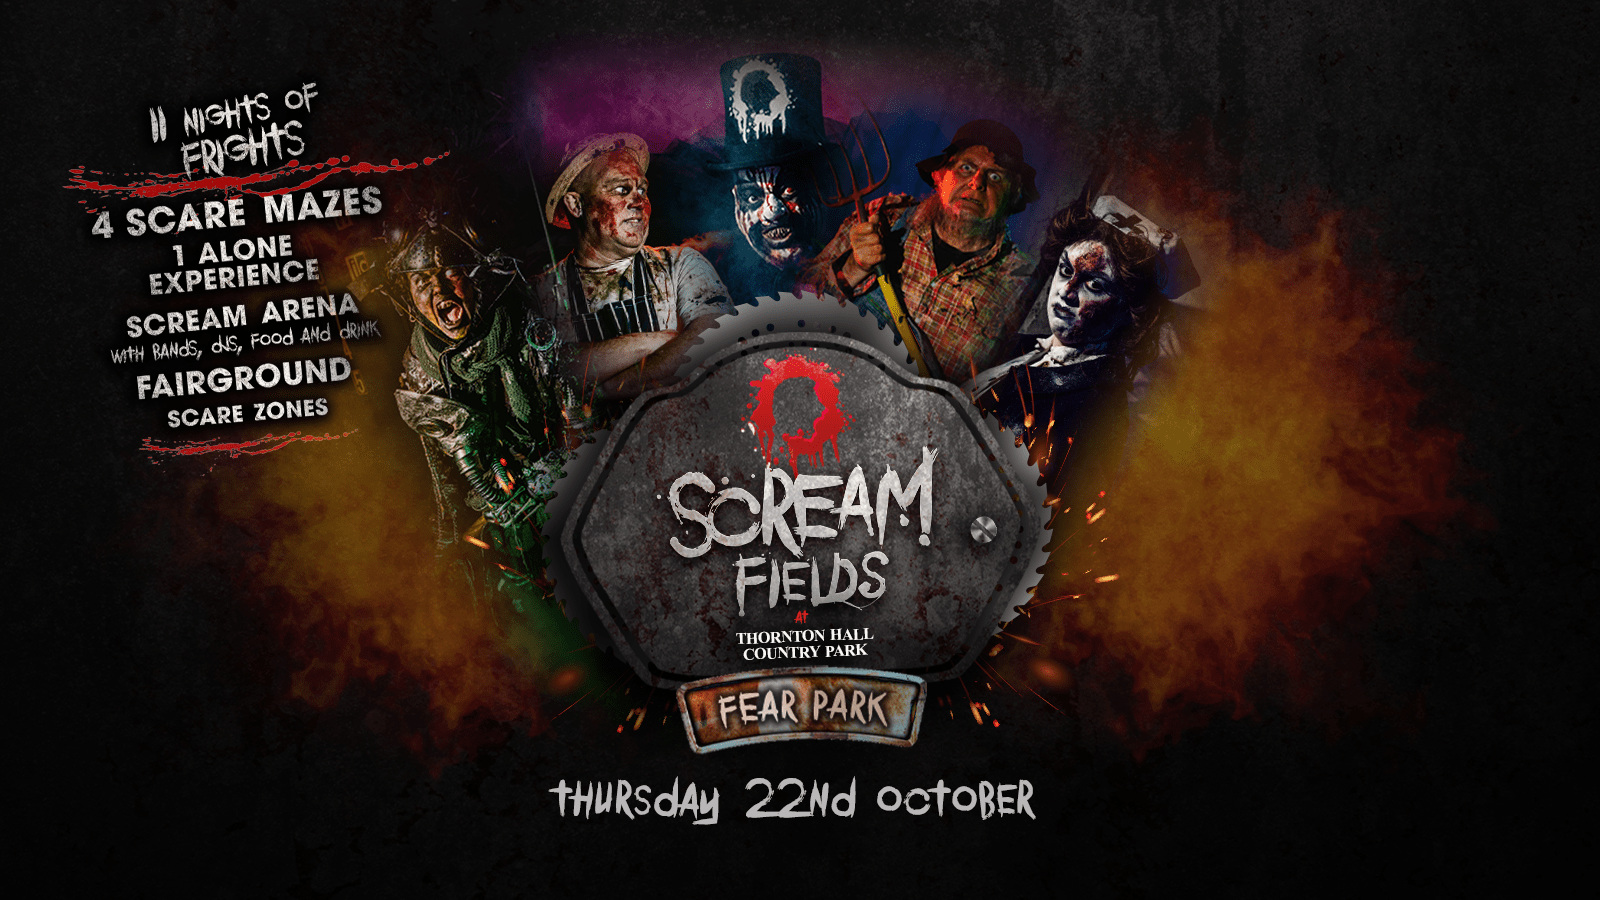 7.30PM – Screamfields: Thursday 22nd October 2020